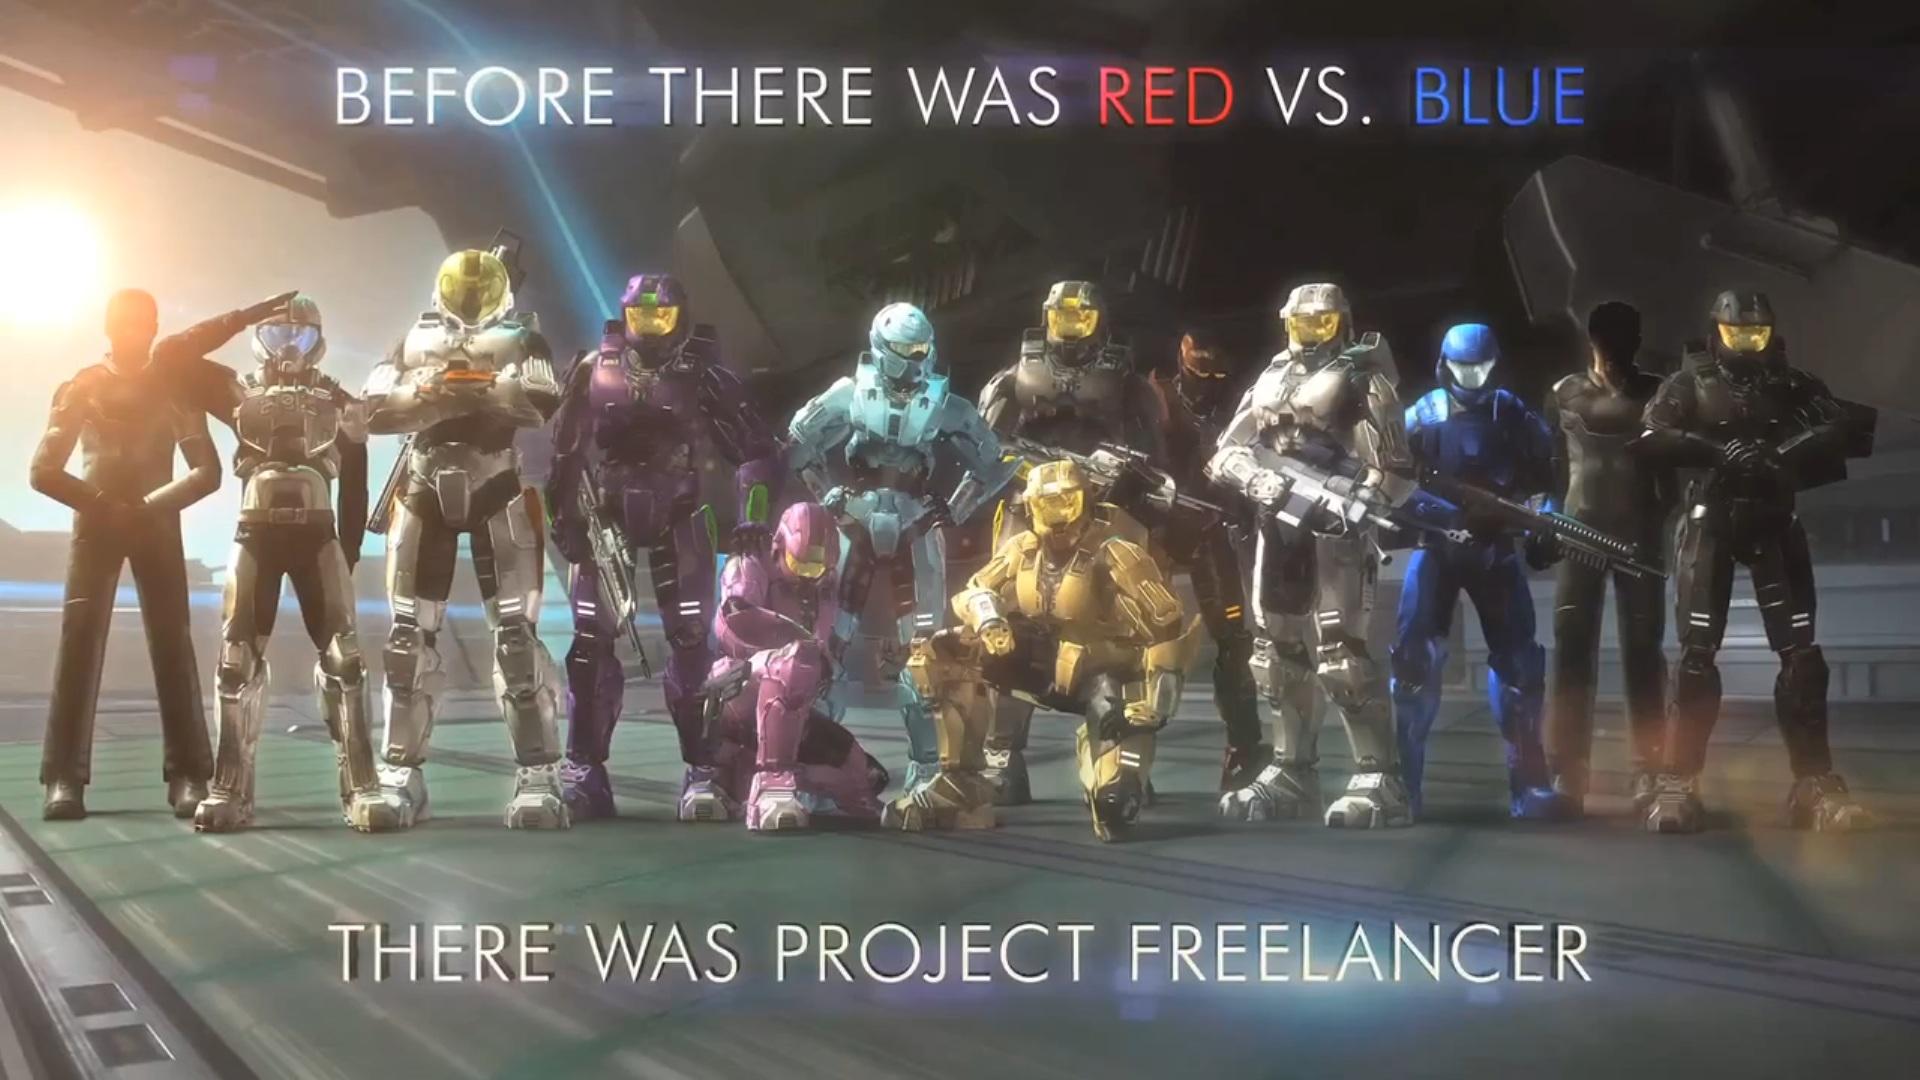 Project Freelancer poster